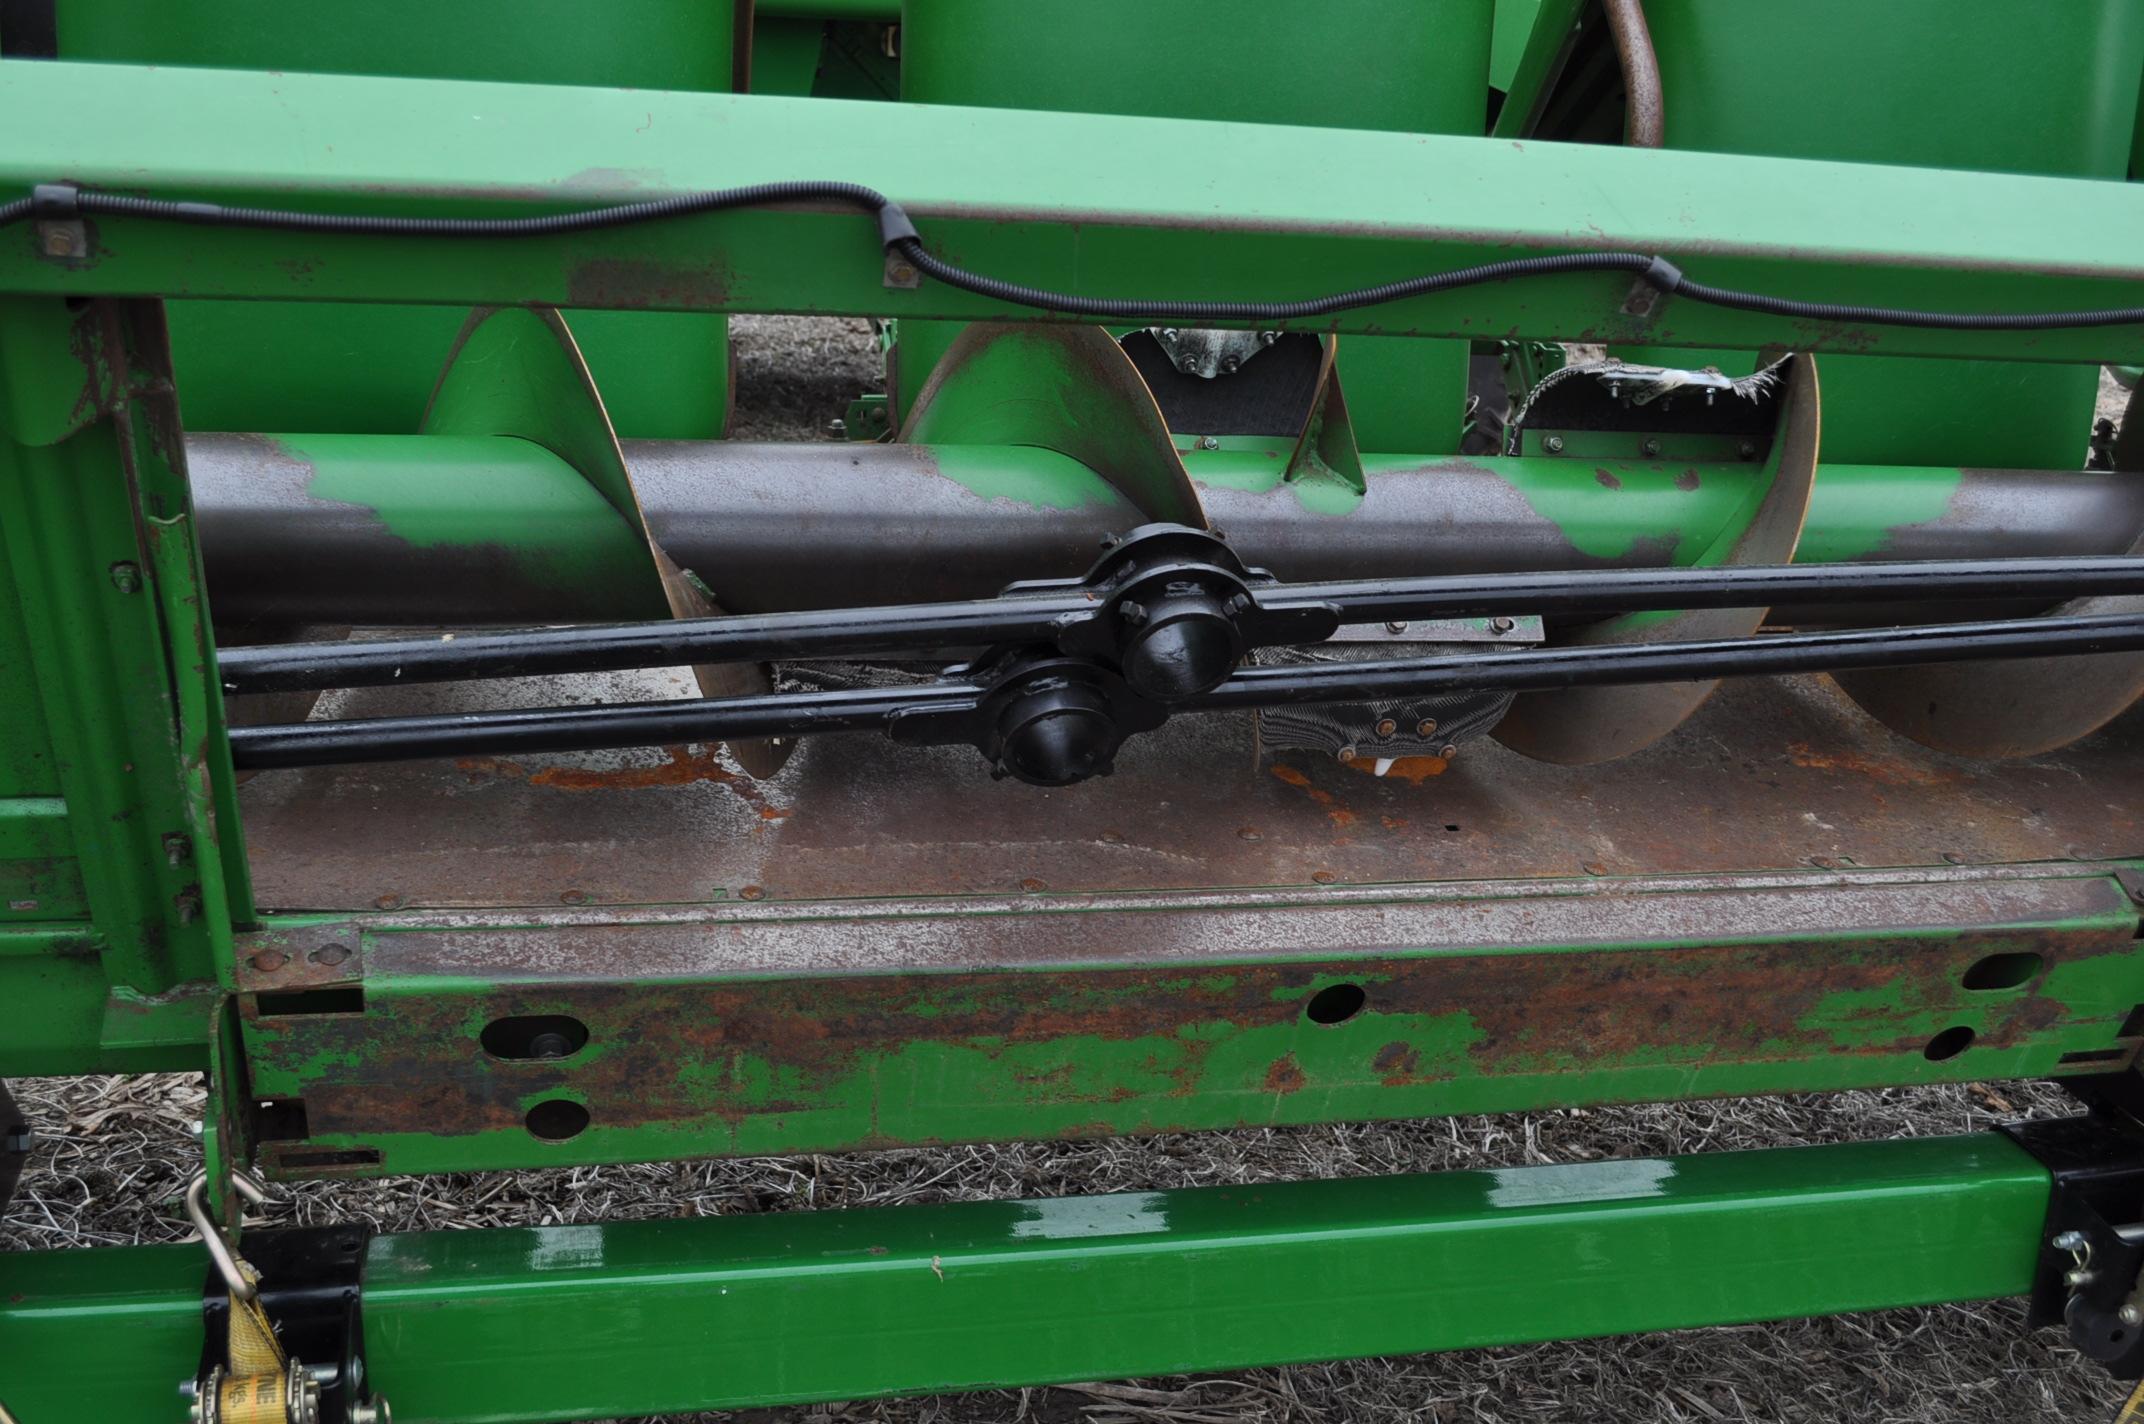 John Deere 693 corn head, poly, hyd drive, down corn reel, pto shafts, SN 655654 - Image 9 of 17